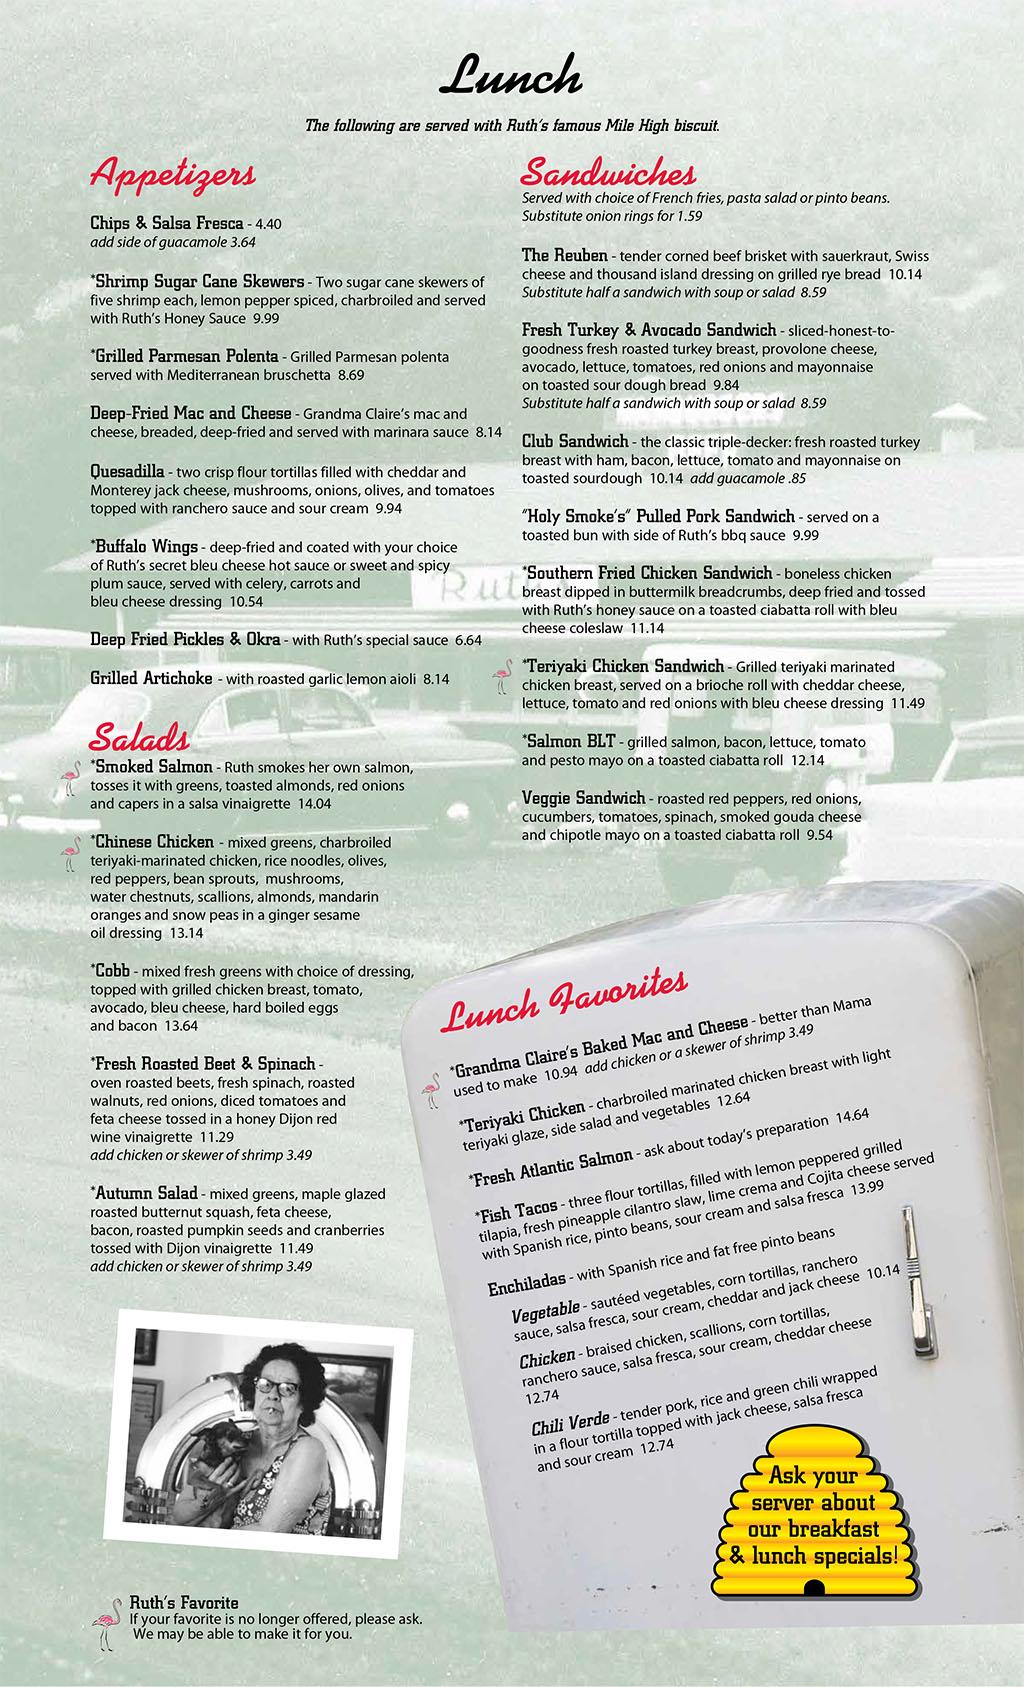 Ruths Diner menu - lunch, apps, salads, sandwiches